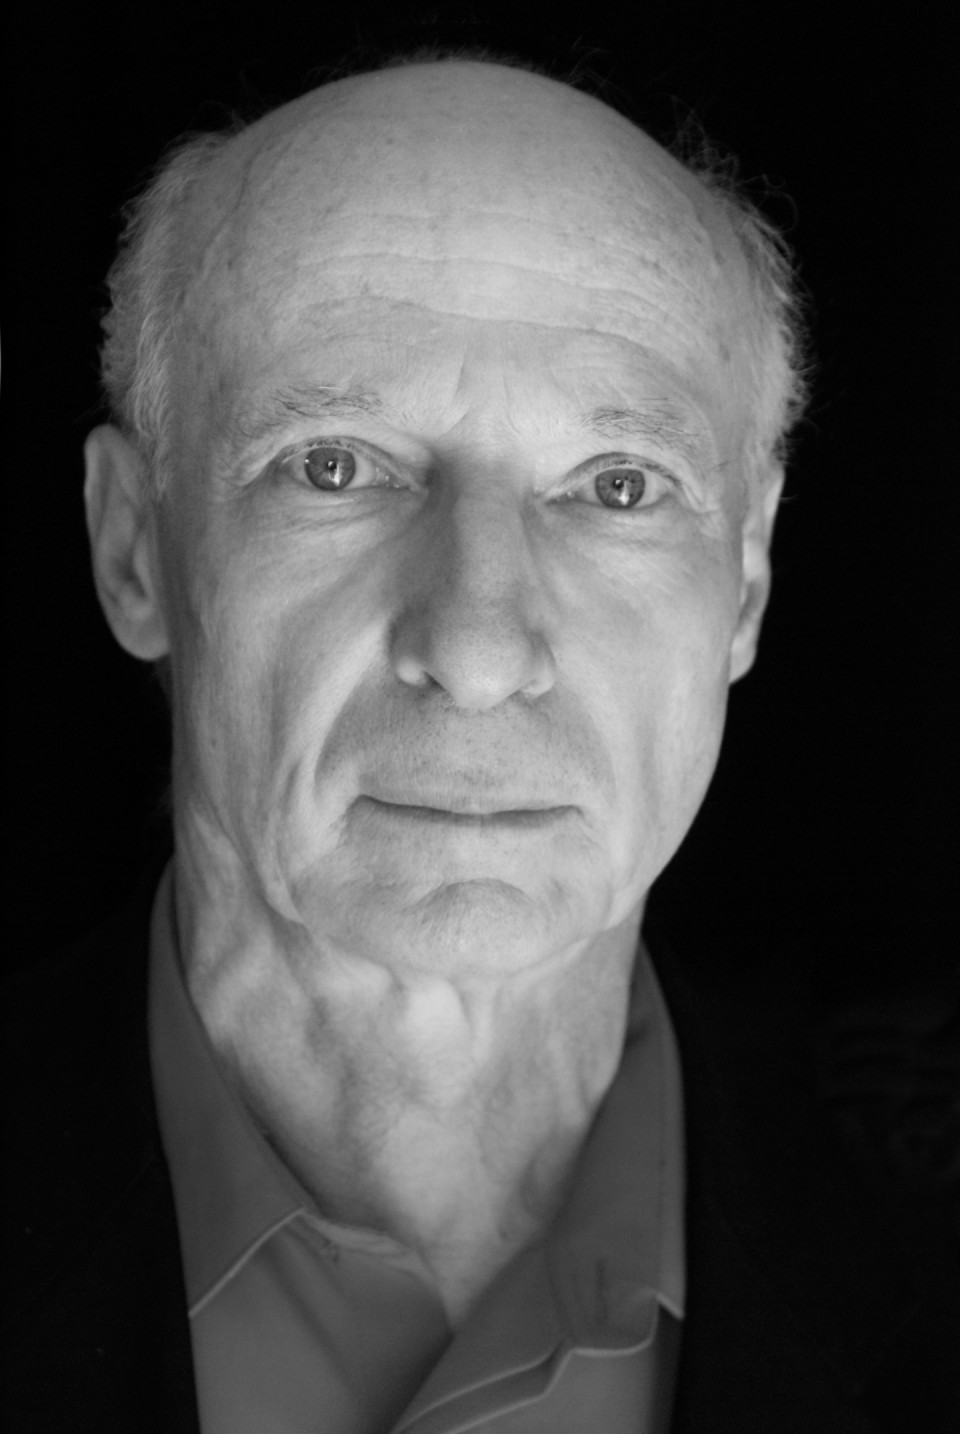 Yves Daoust [Photograph: Léo Perrin, Montréal (Québec), September 2011]